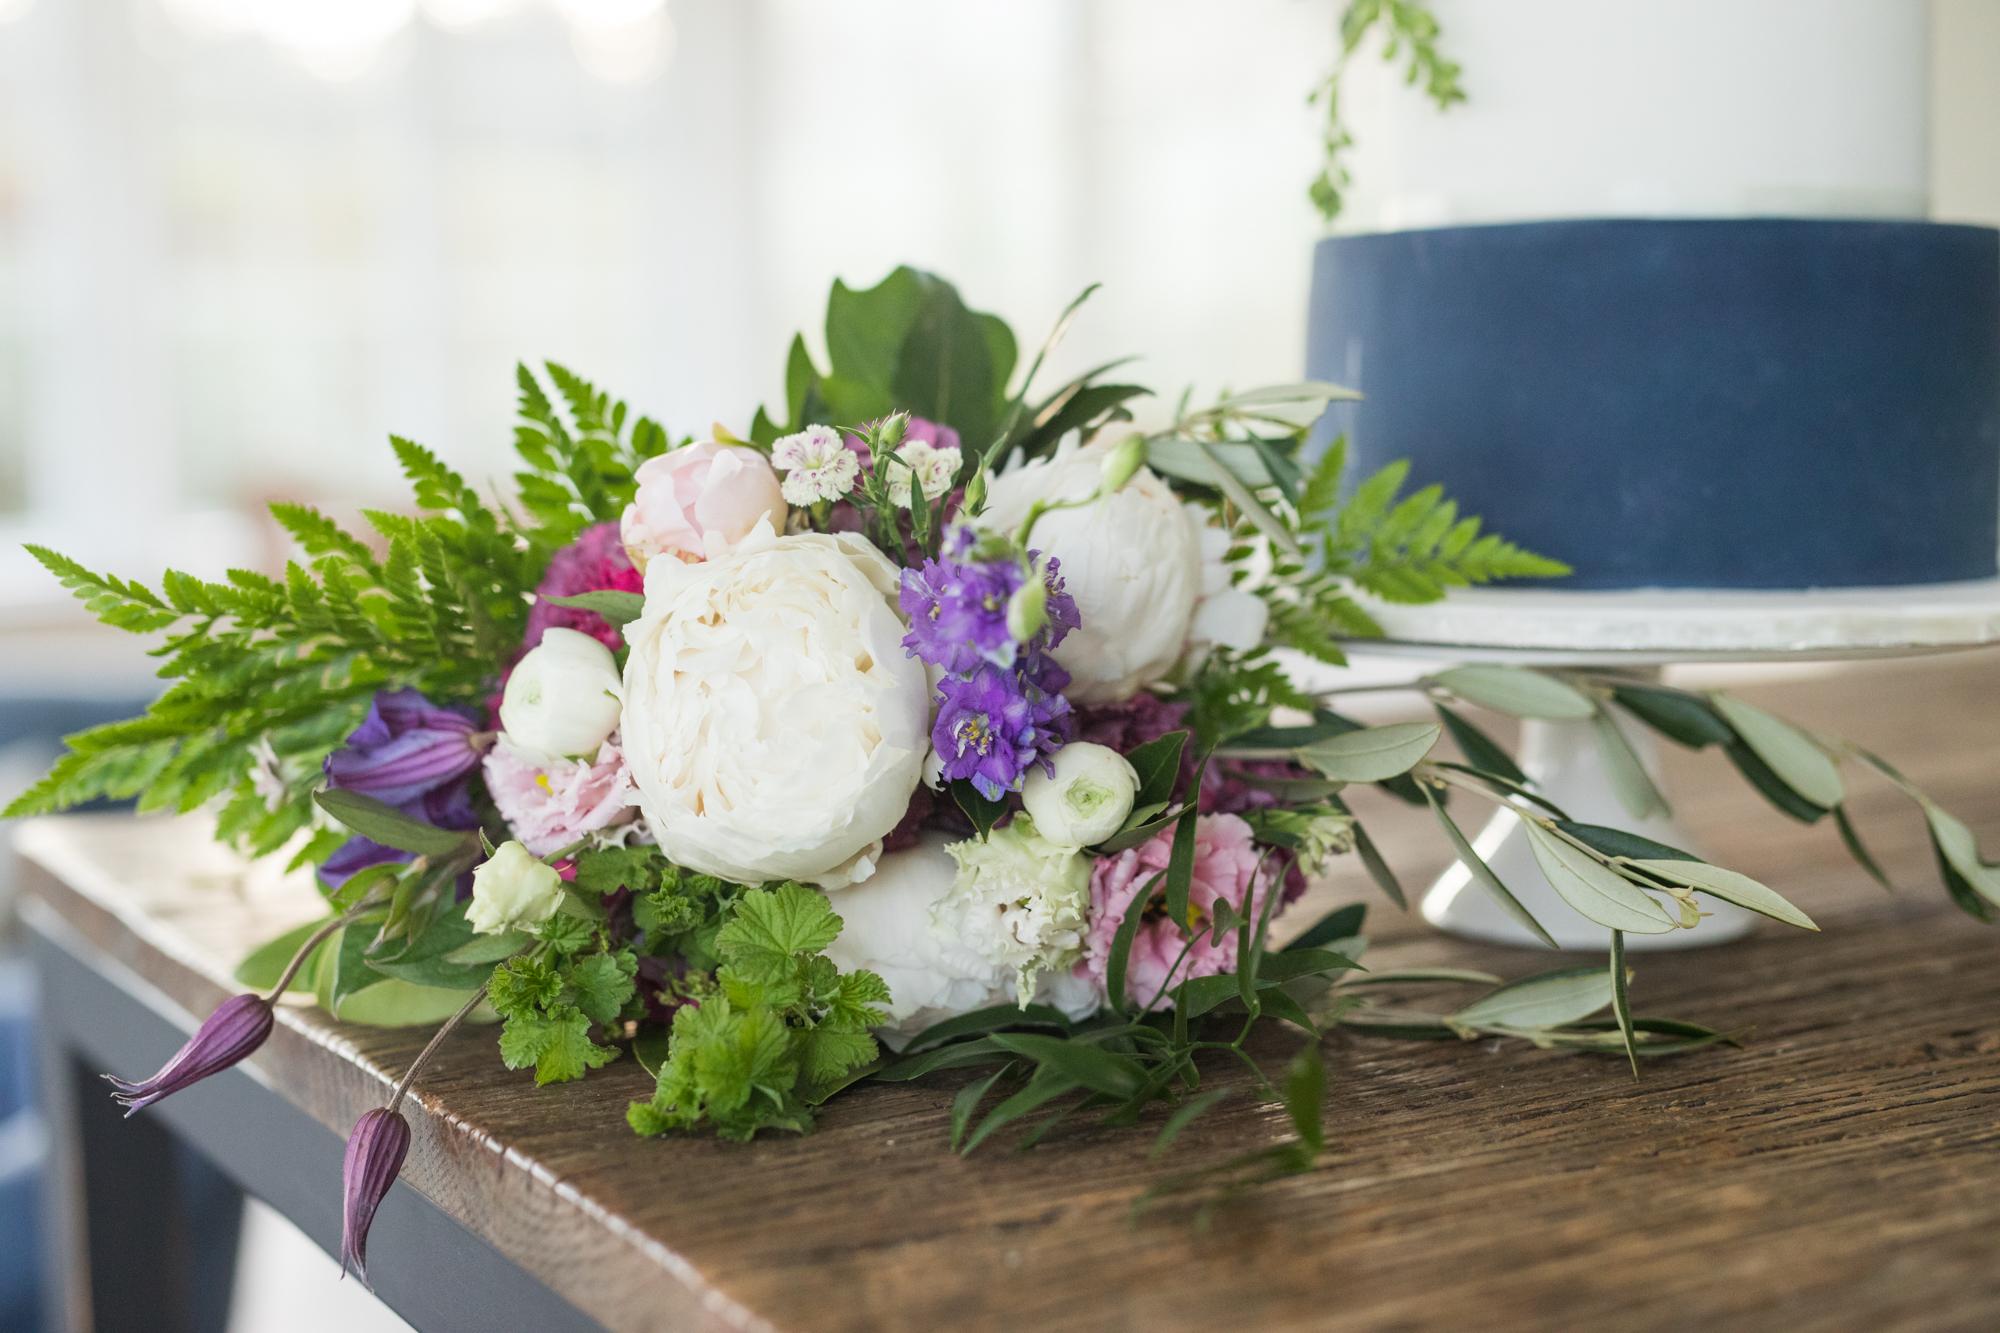 cakes_and_flowers_fotograf+lisa-marie+chandler_064_web.jpg